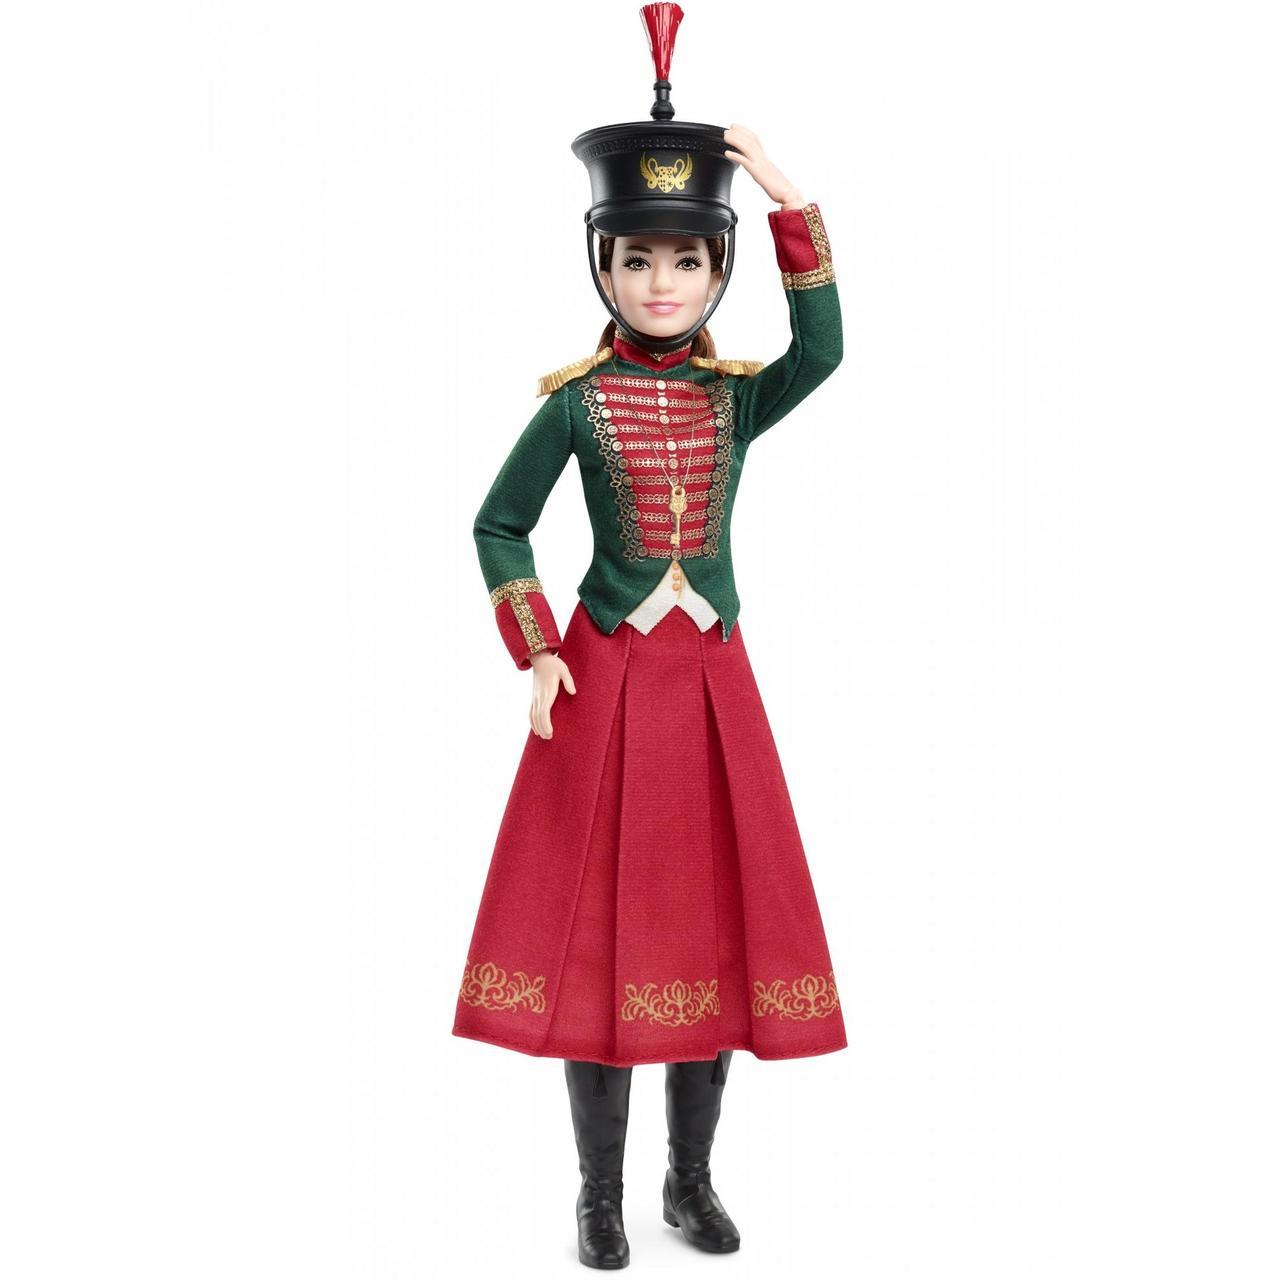 Кукла Барби Клара Щелкунчик и четыре королевства Barbie The Nutcracker and the Four Realms Clara Toy Soldier